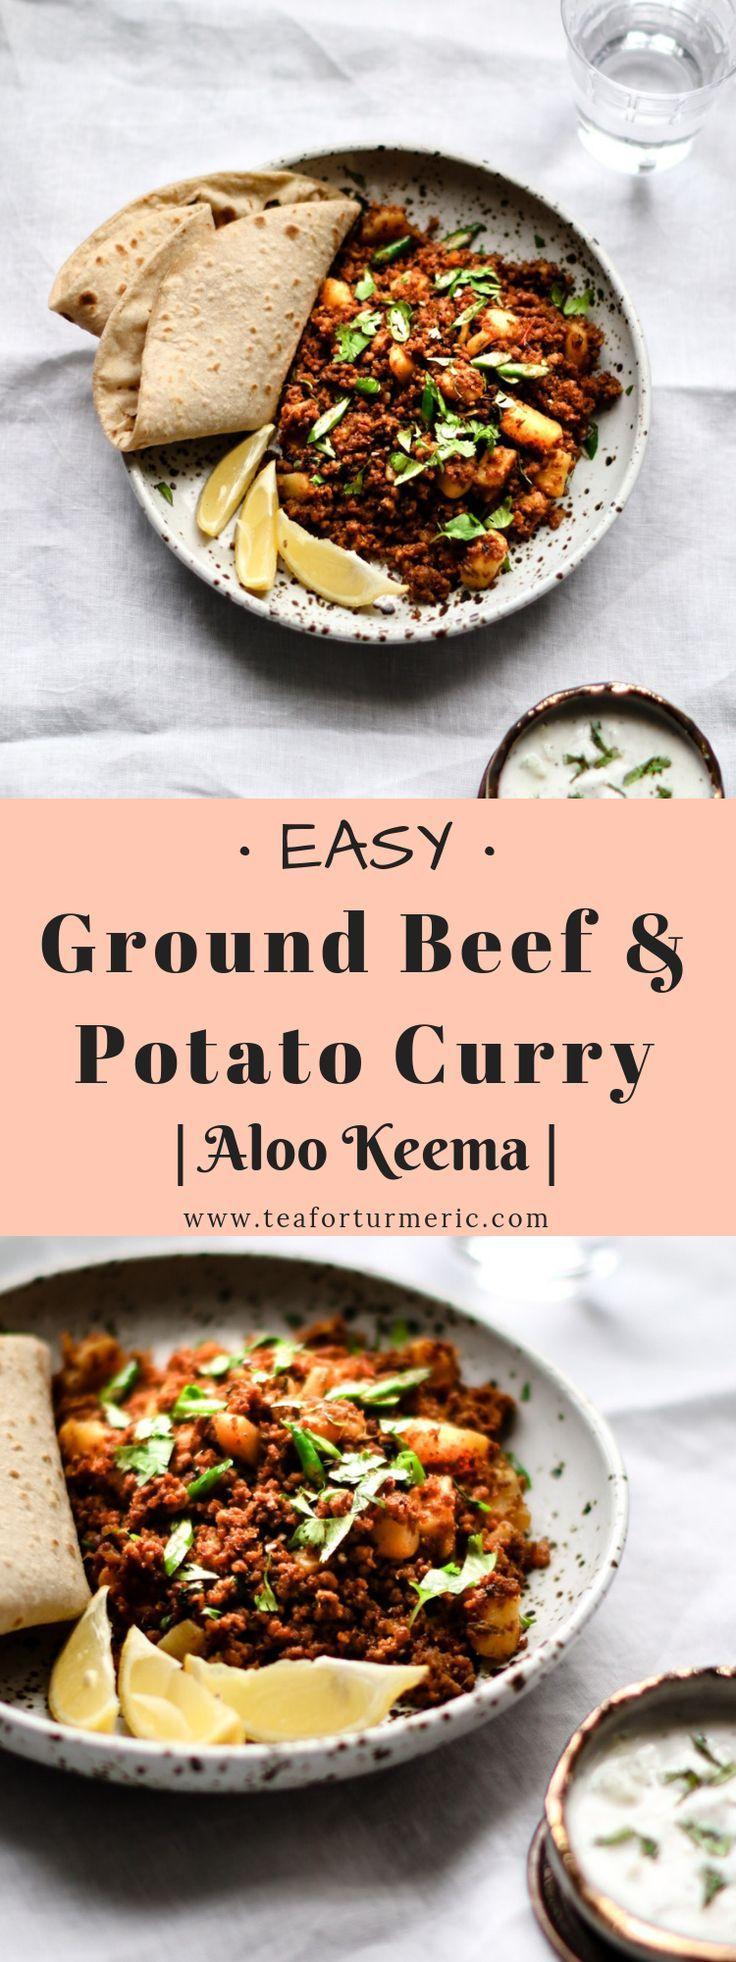 Pakistani Aloo Keema Ground Beef And Potato Curry Recipe Potato Curry Ground Beef And Potatoes Beef And Potatoes